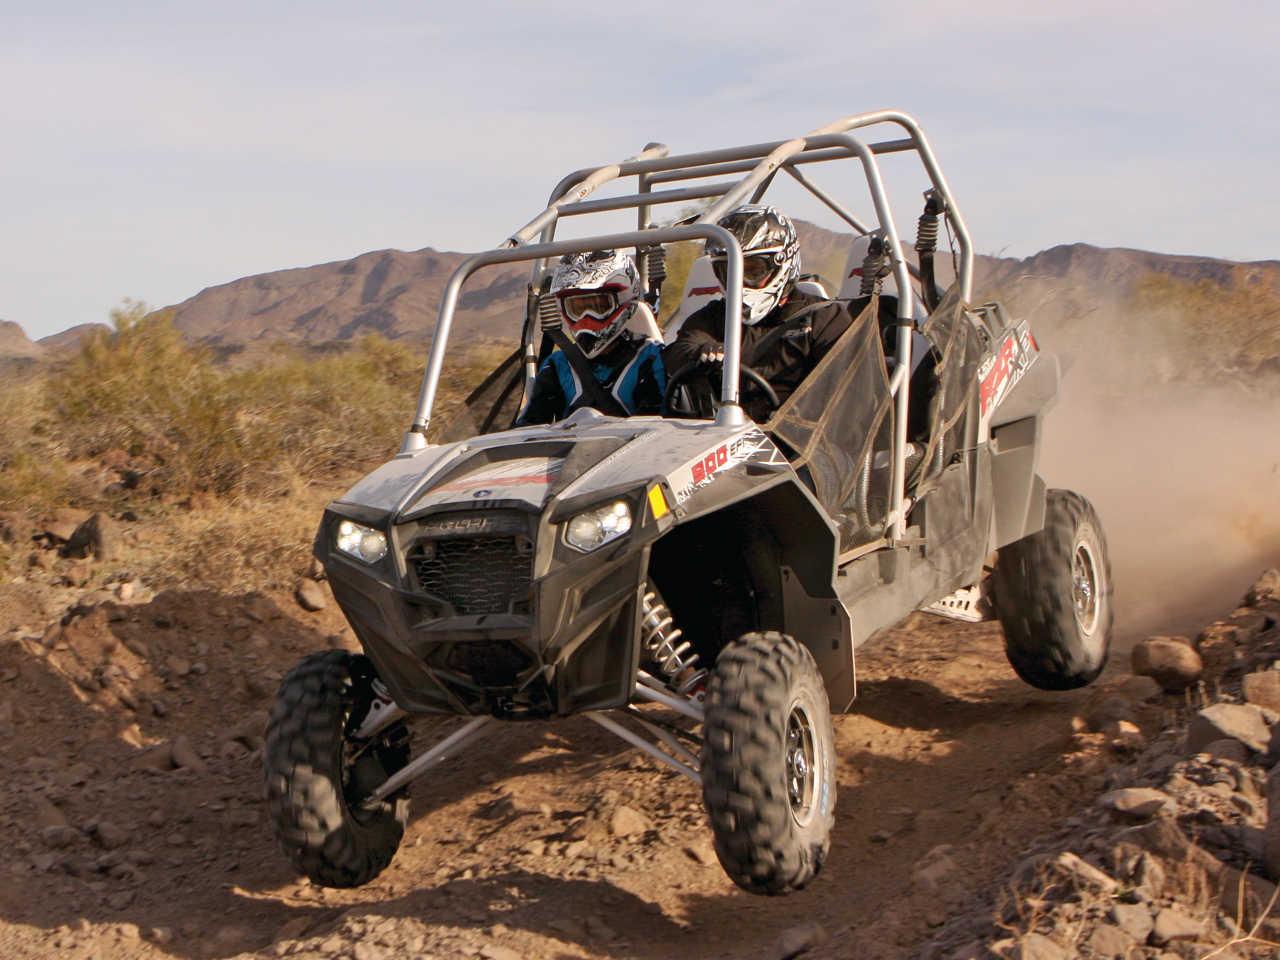 Long Term Report - The Polaris RZR XP4 900 EPS   ATV Illustrated